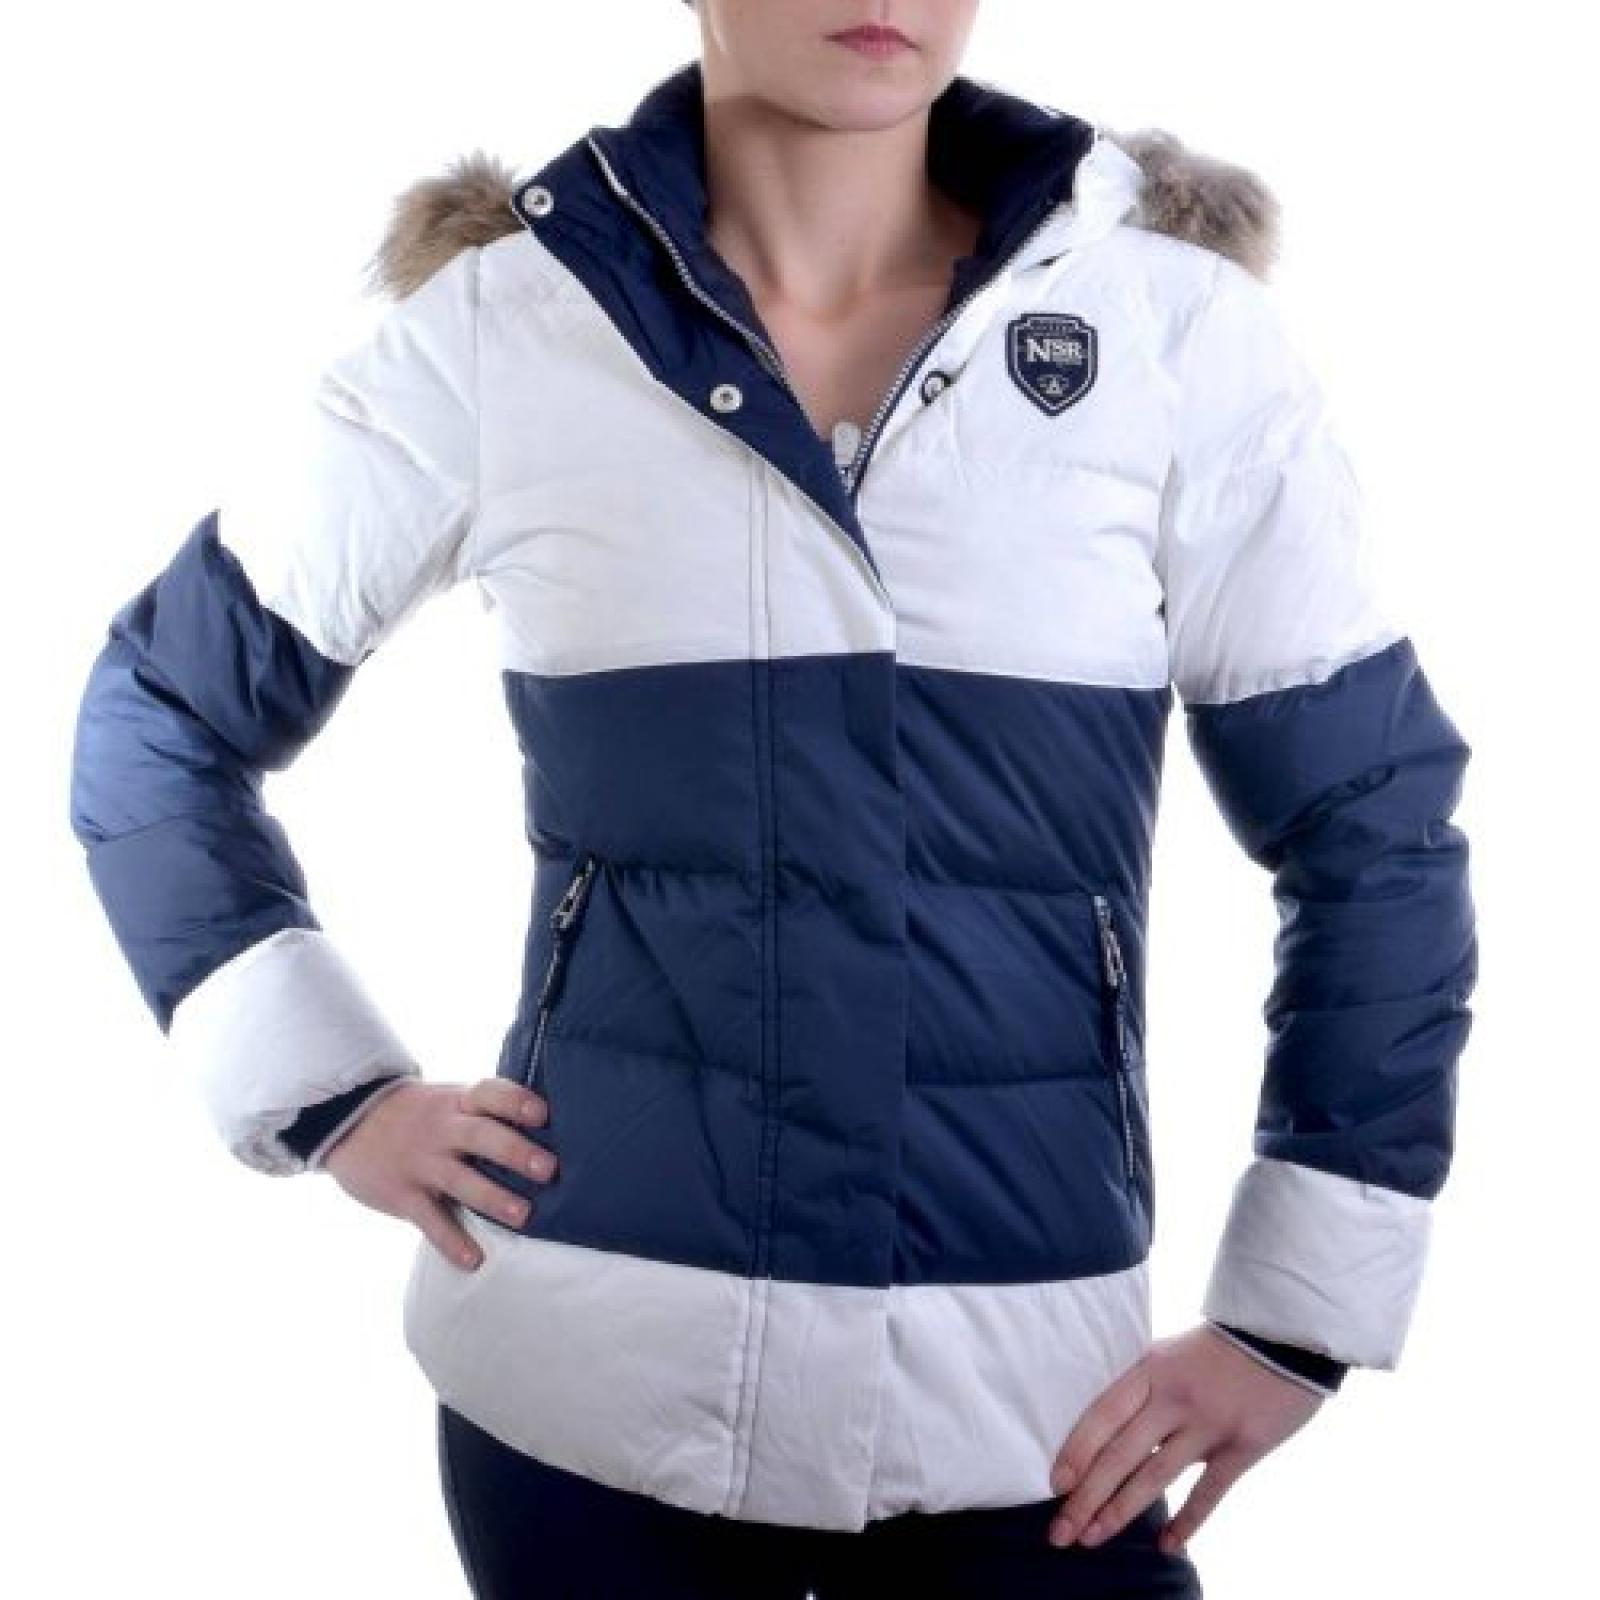 Gaastra Damenjacke Icestorm Gr. XXL UVP 339,95 Euro 36127032 Creme 338 Damen Jacke